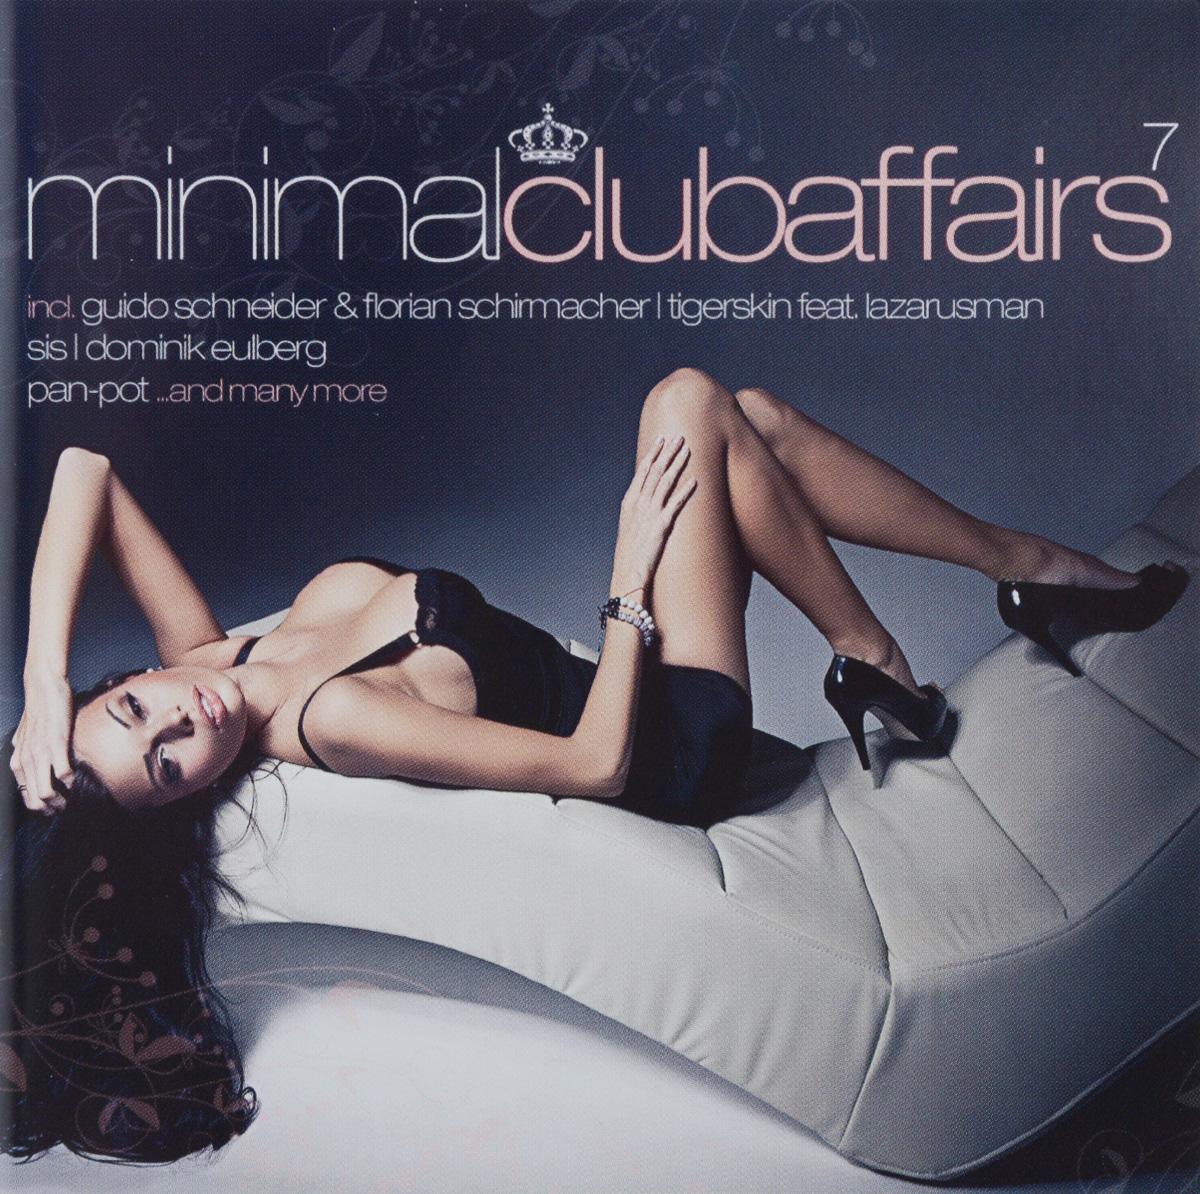 Фото - Minimal Club Affairs. Vol. 7 (2 CD) minimal house 2 cd